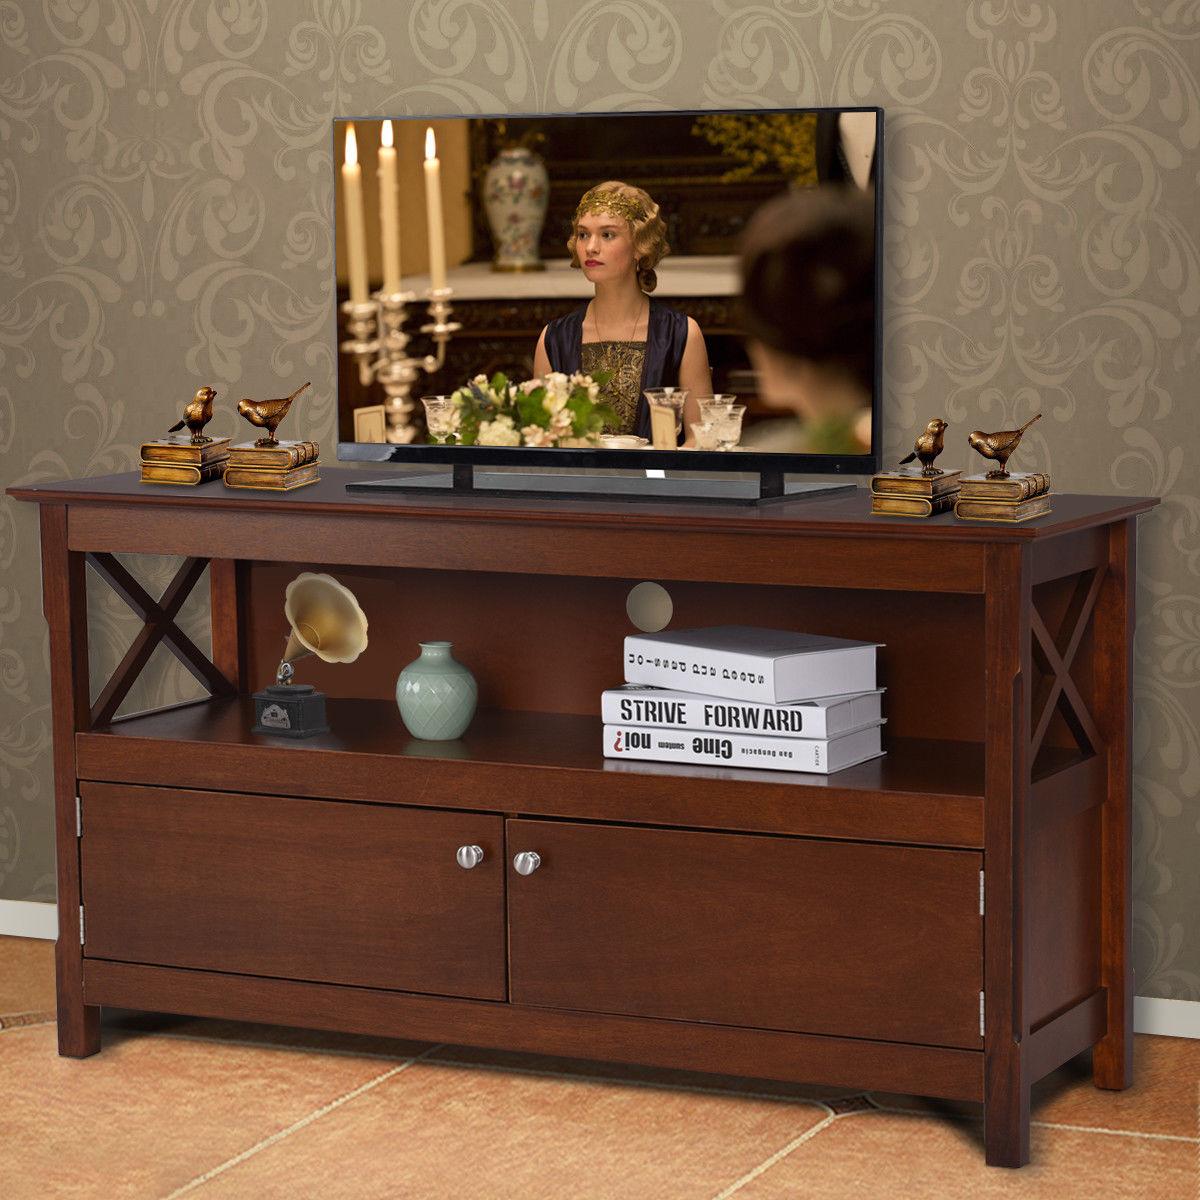 "44"" TV Stand Console Wooden Storage Cabinet Shelf Media Center Stand - image 9 de 9"